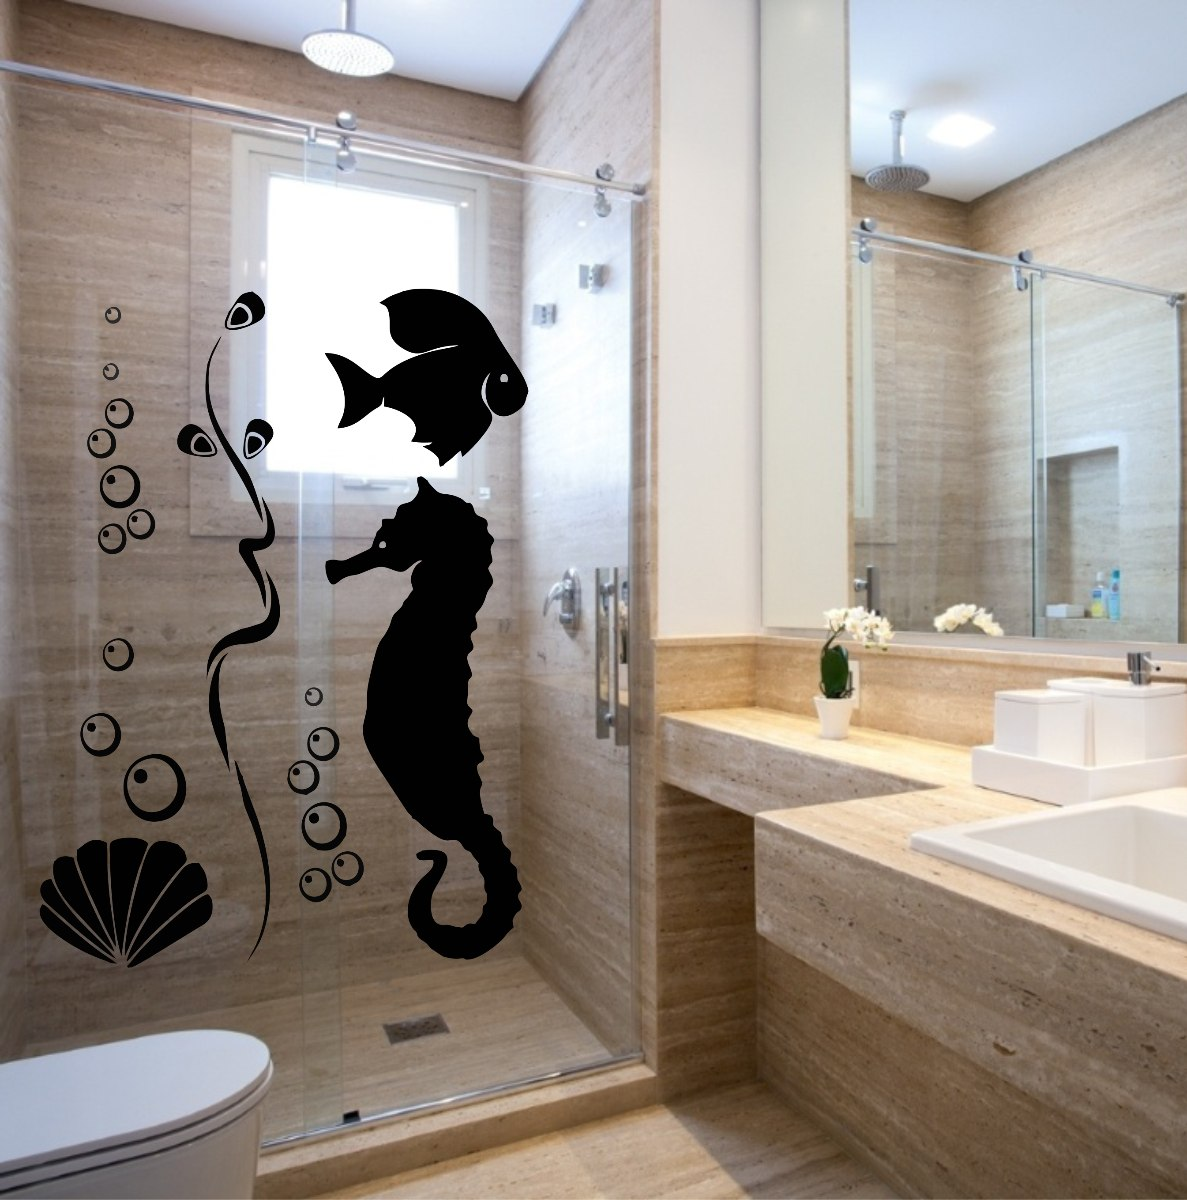 Banheiro Com Papel De Parede6 150x150 Jpg Pictures to pin on Pinterest #826849 1187 1200